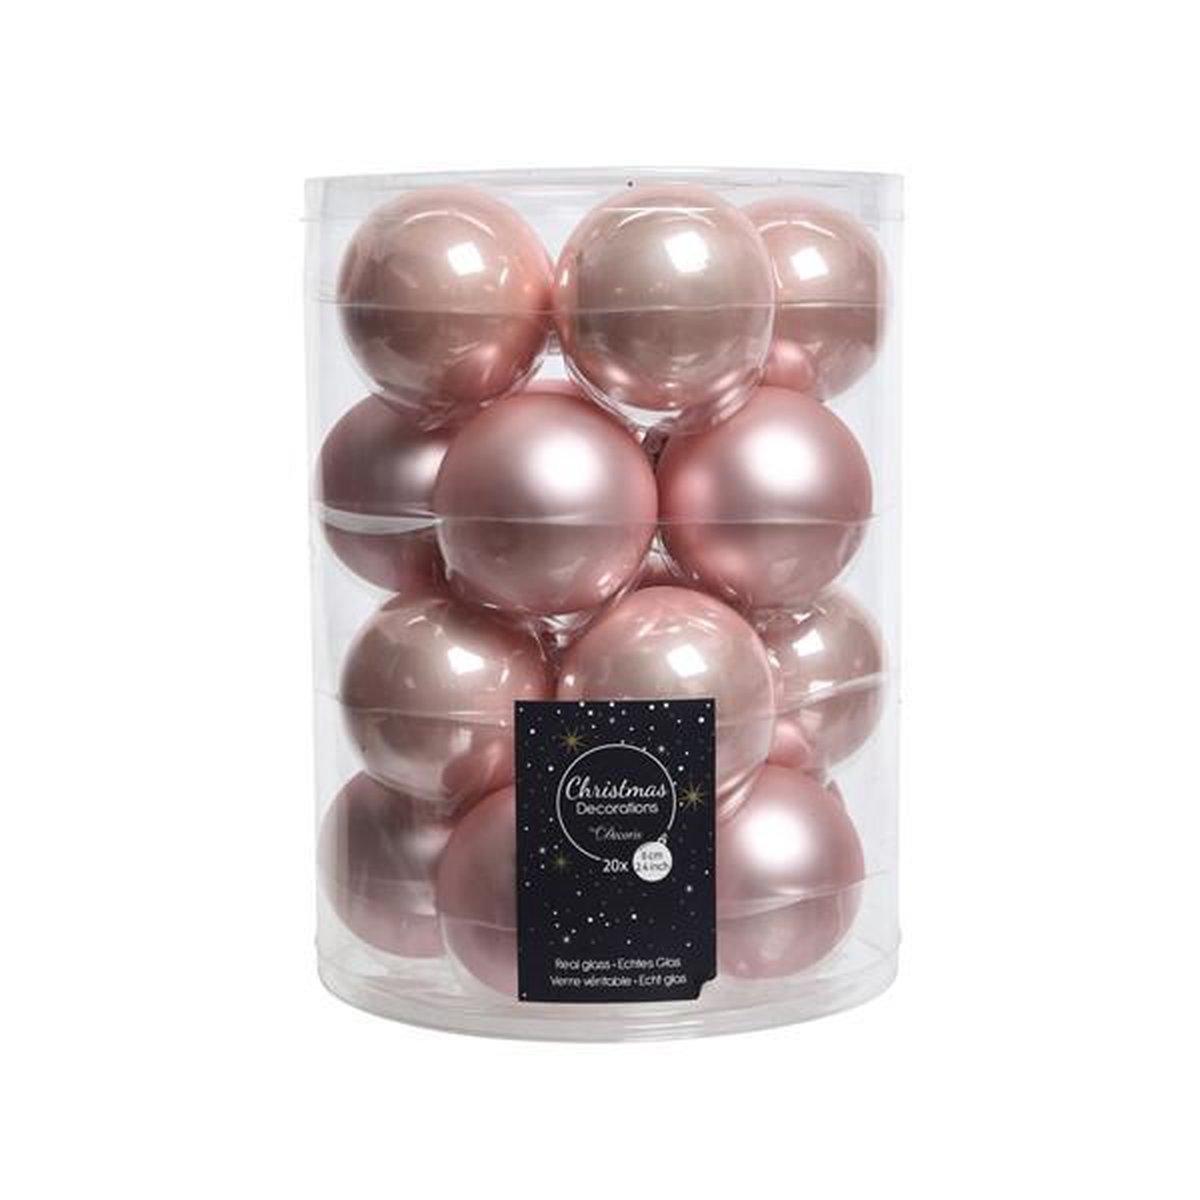 Decoris kerstballen - 20 stuks - 6cm - glas - Decoris